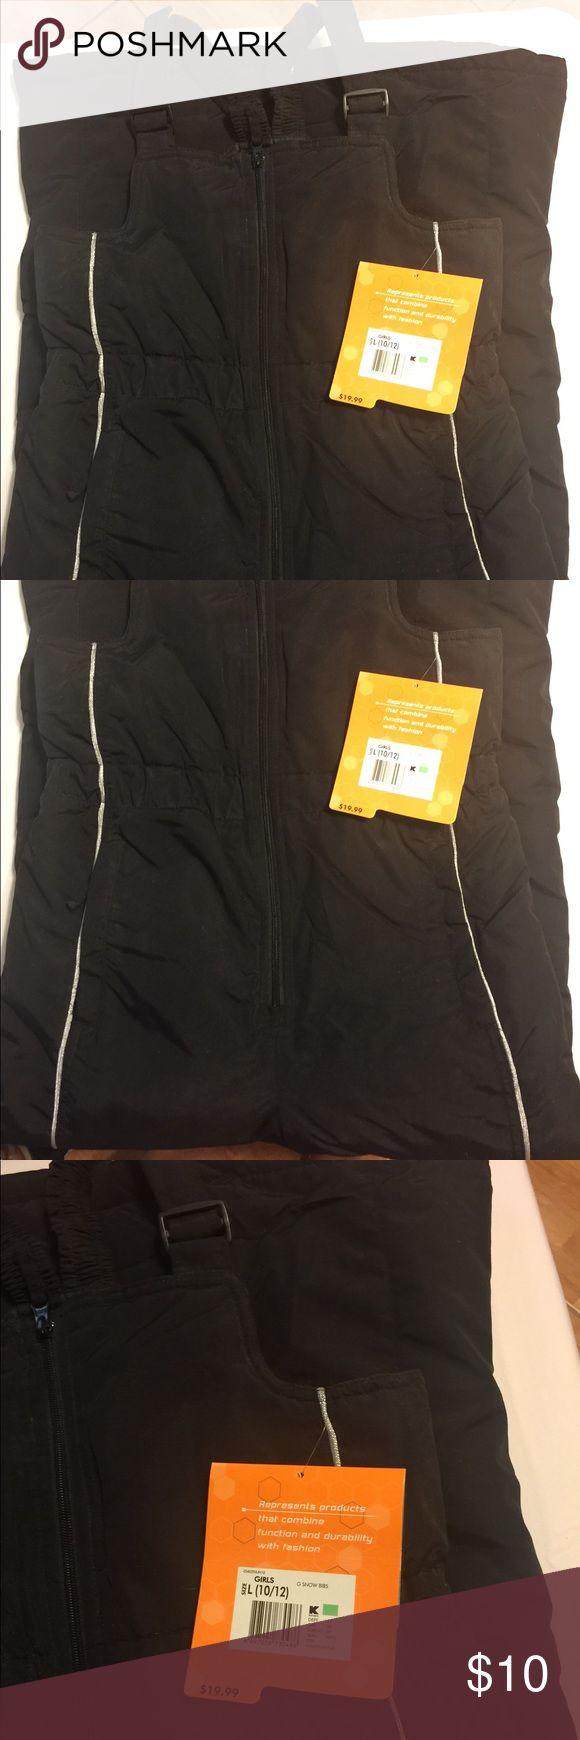 Size Large girls black Snow Suit, NWT Size Large girls black Snow Suit, NWT, purchased but never worn. Athletech One Pieces